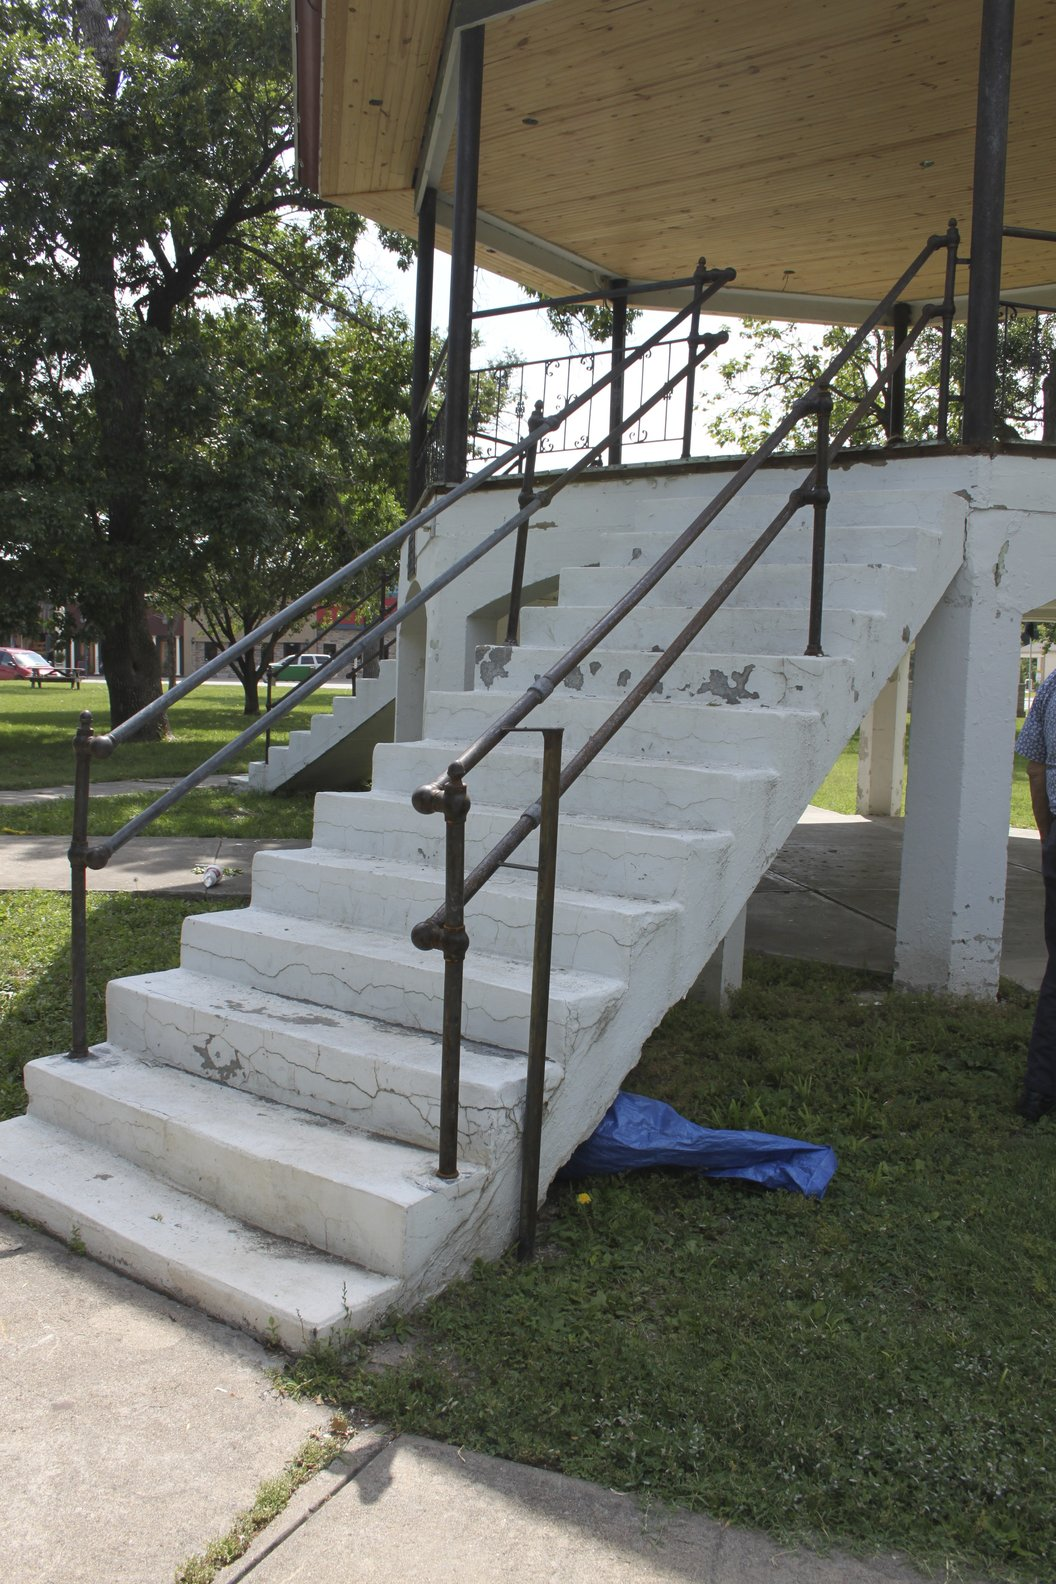 City Square Park Bandstand - 3